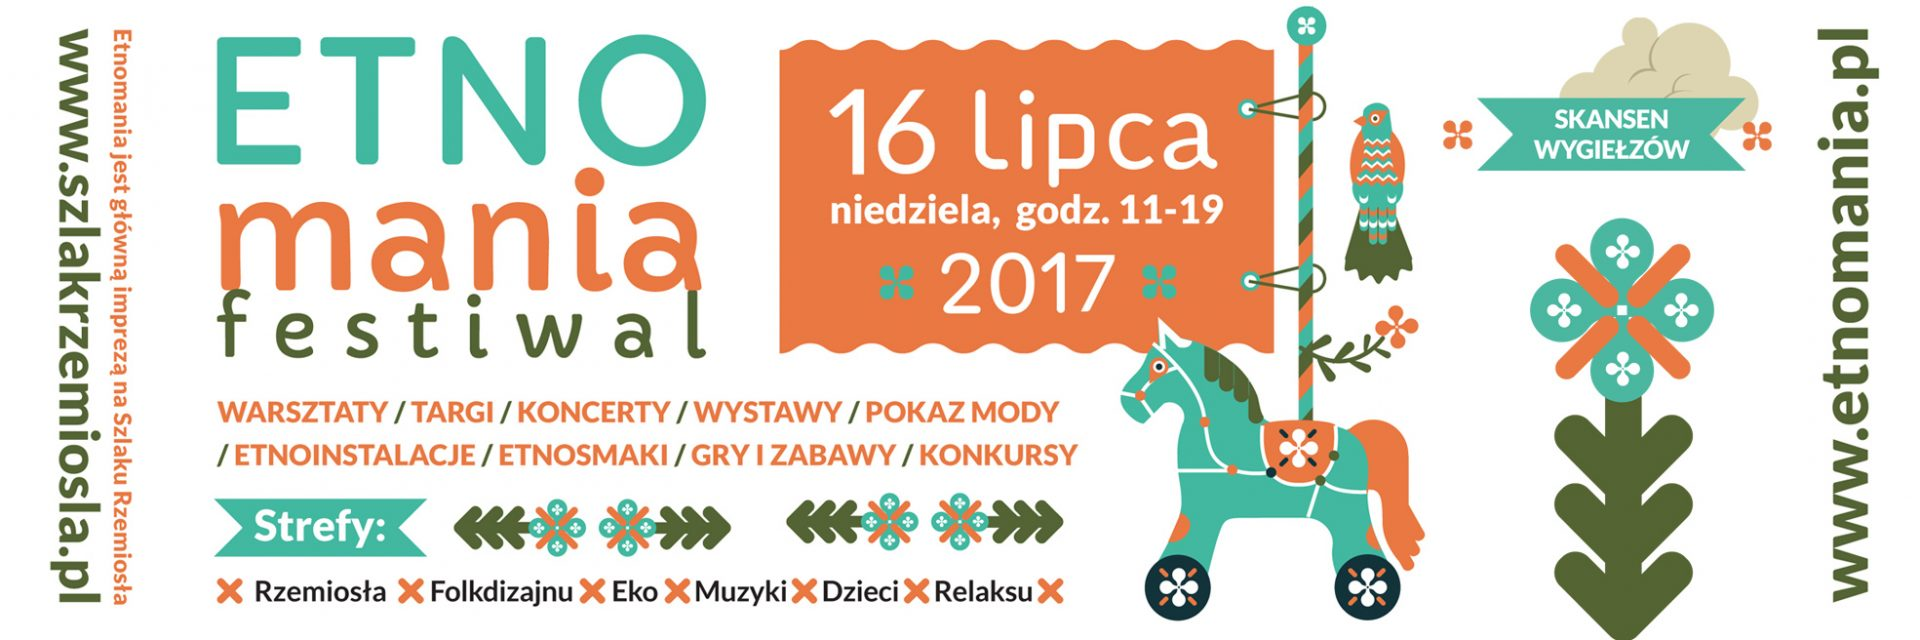 ETNOmania Festiwal 2017